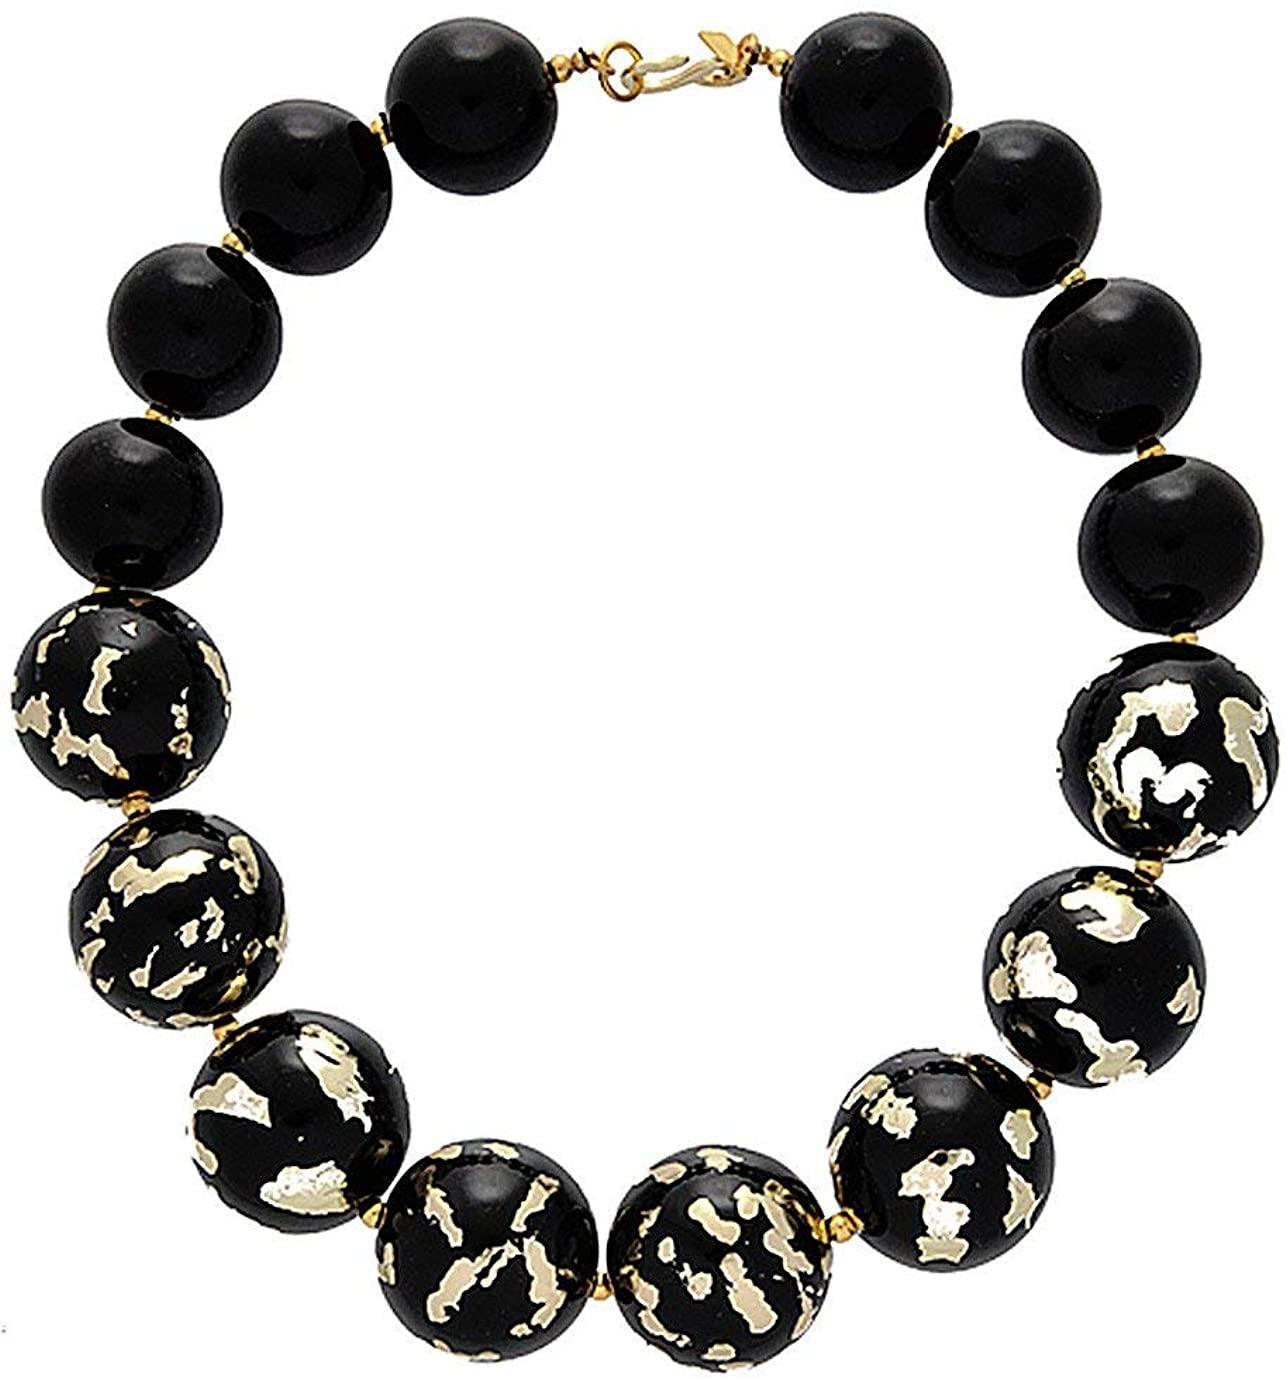 Kenneth Jay Lane Julia Black Scraped Beads Necklace